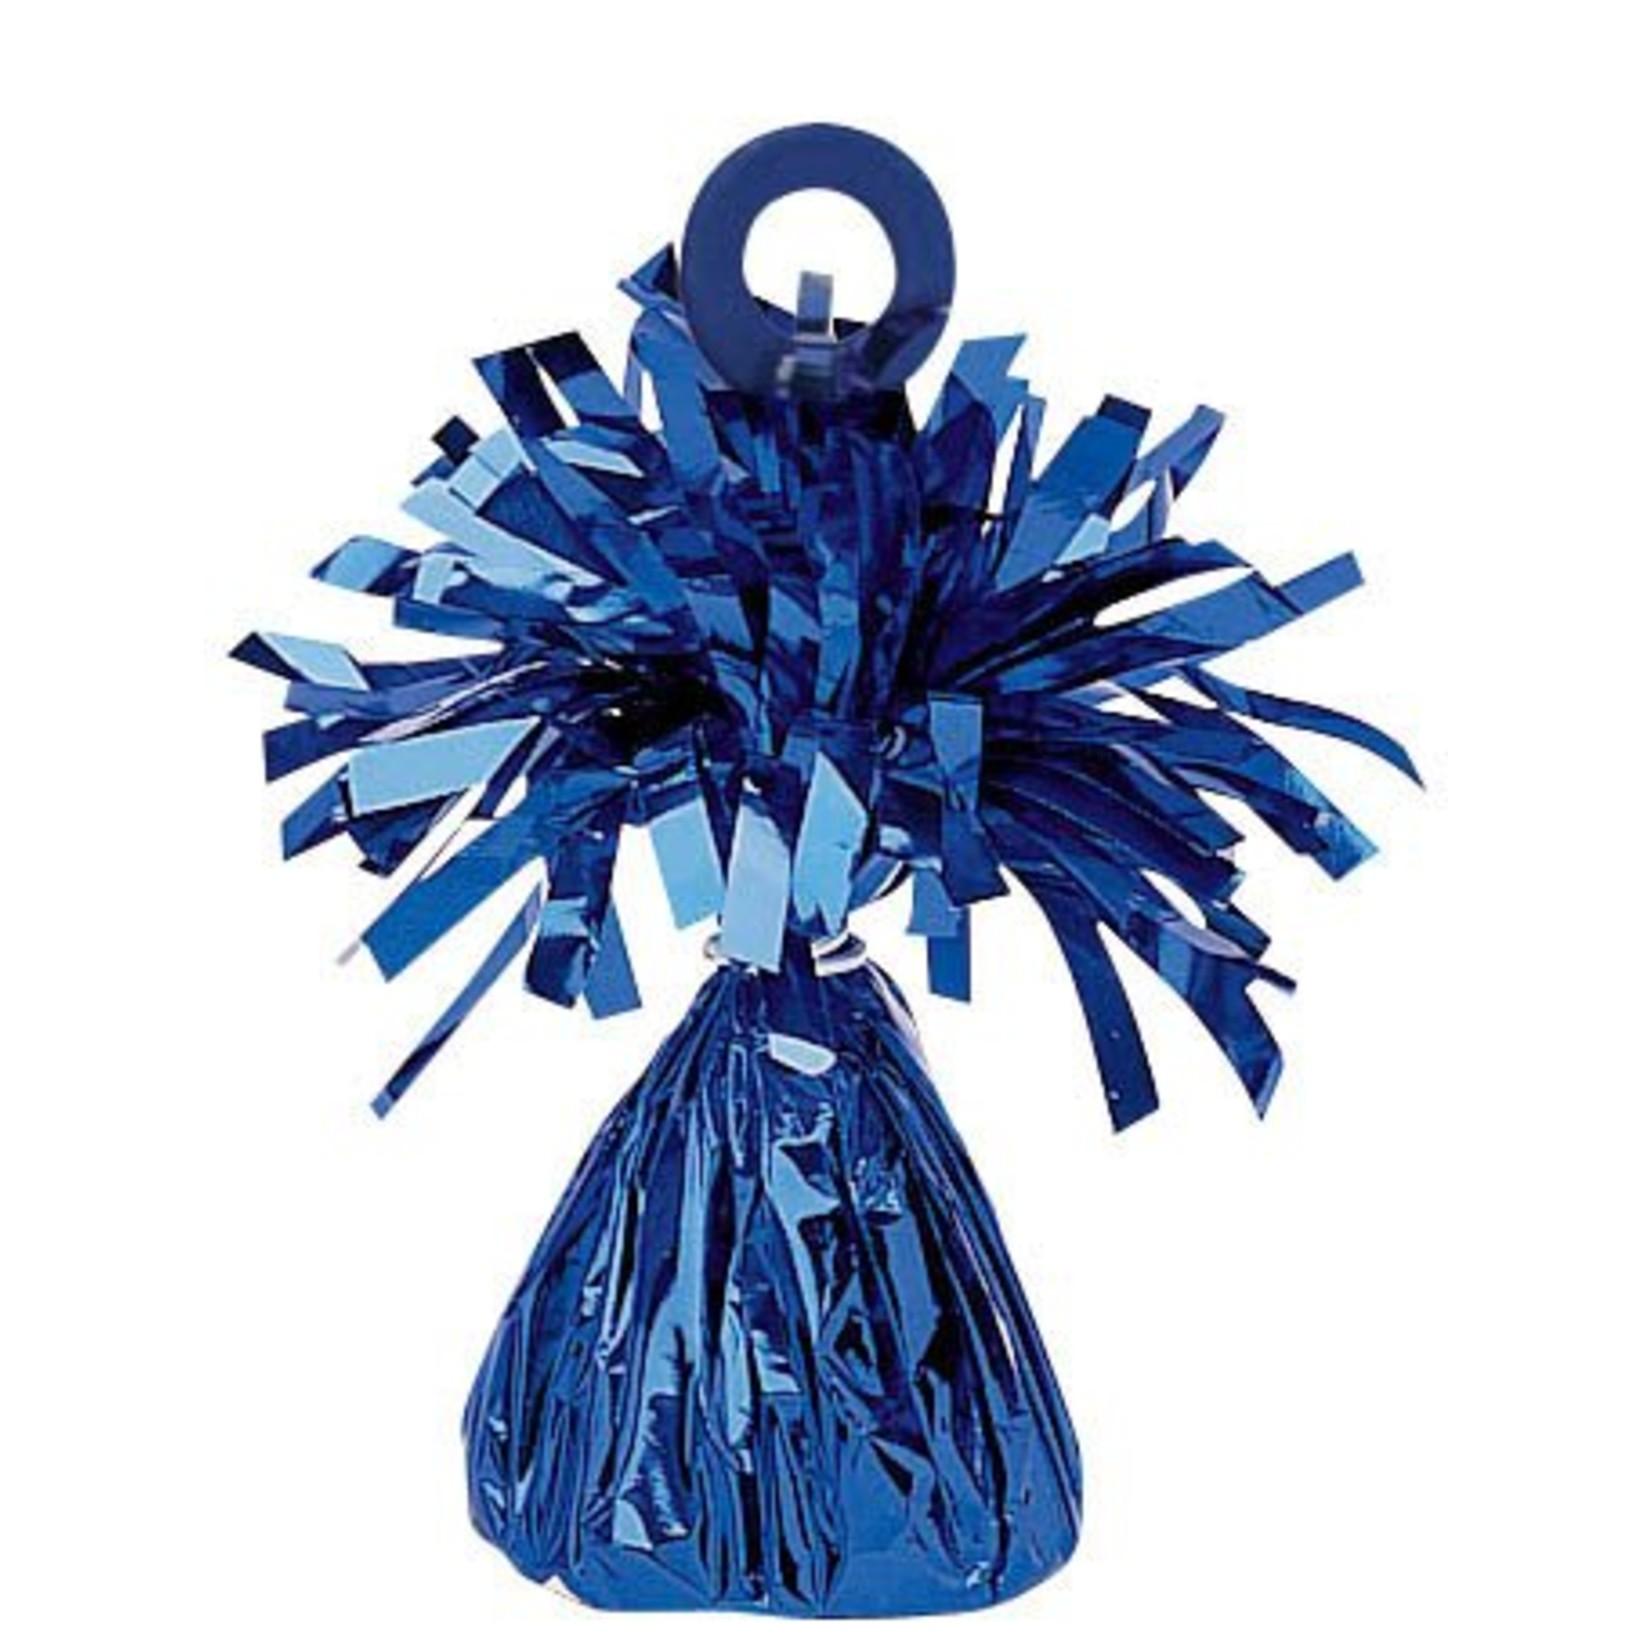 Balloon Weight-Small Foil-Blue-6oz